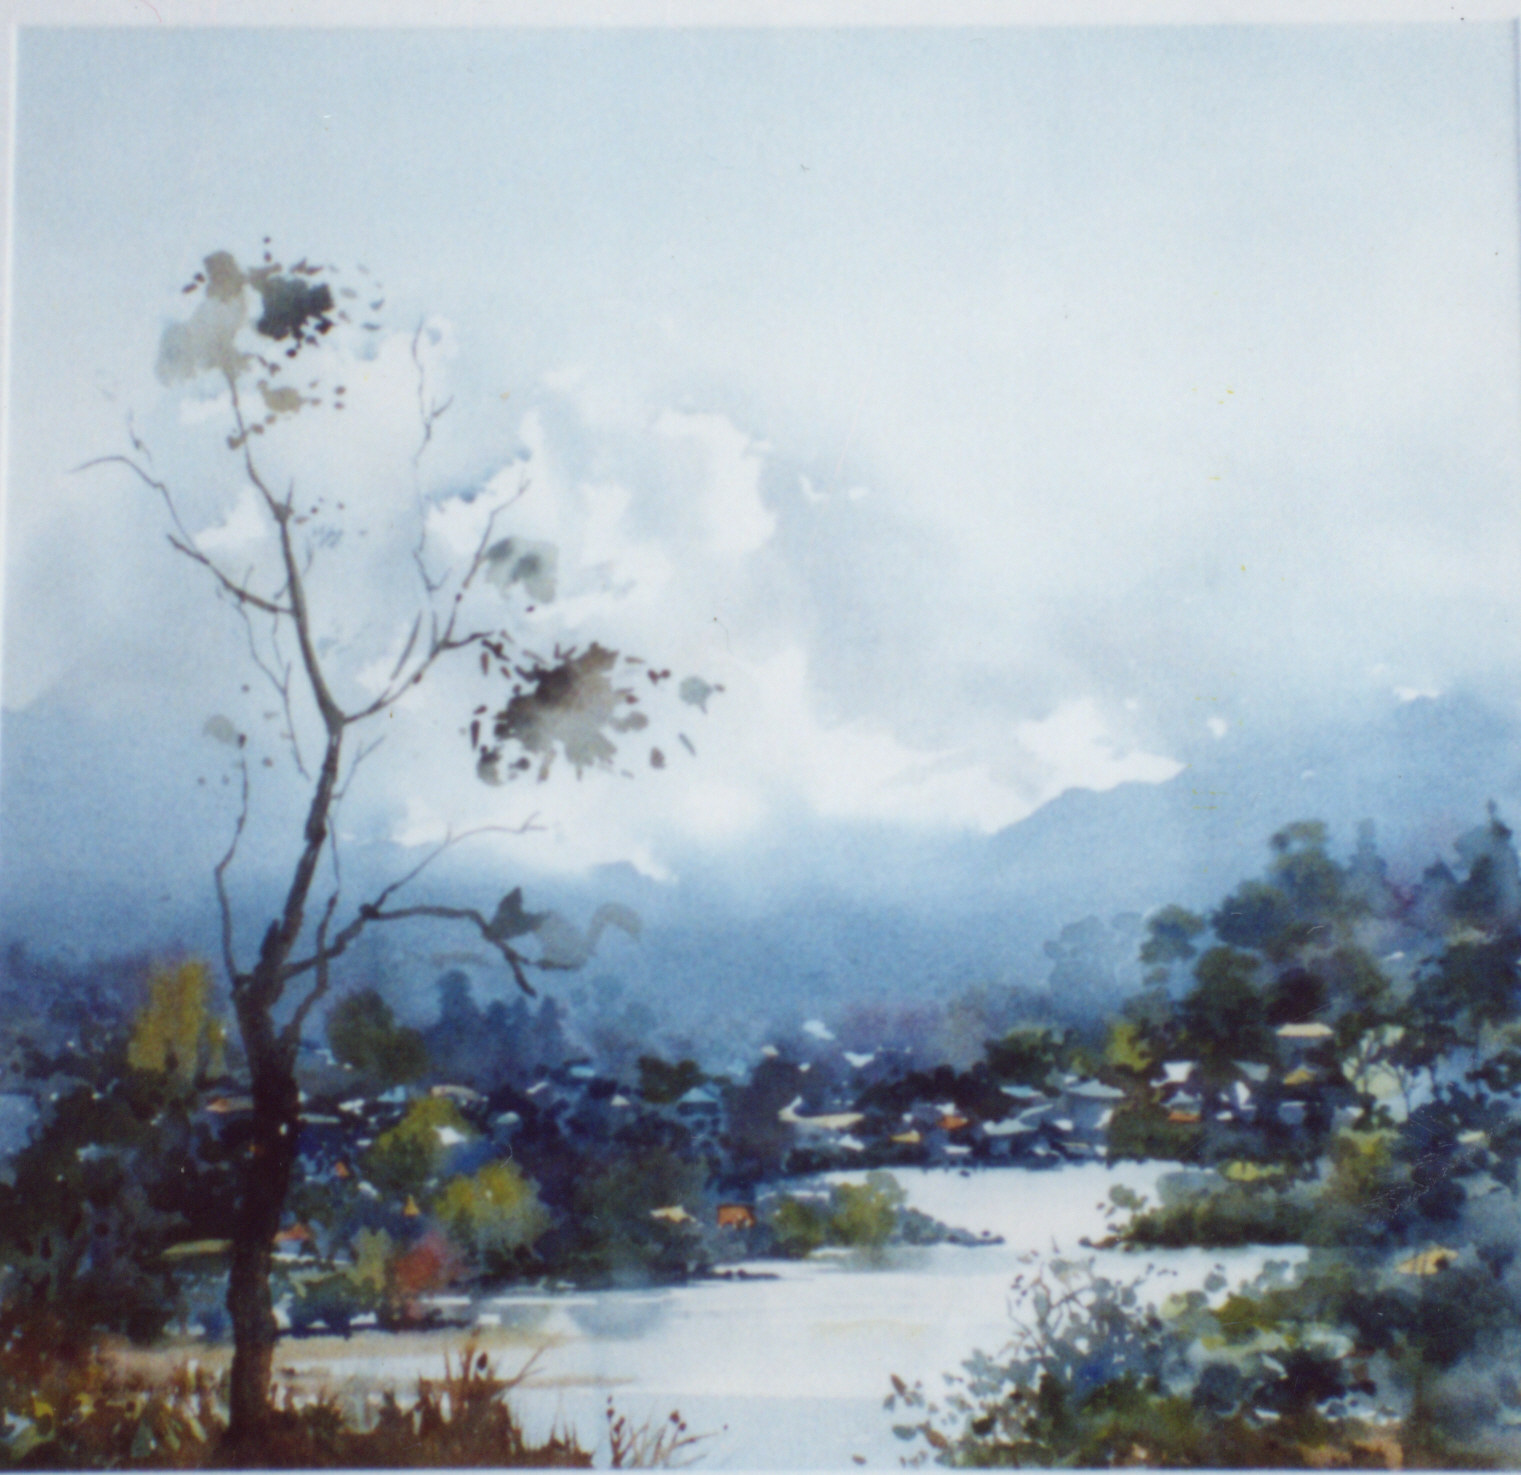 Watercolour painting of Berowra Broken Bay area